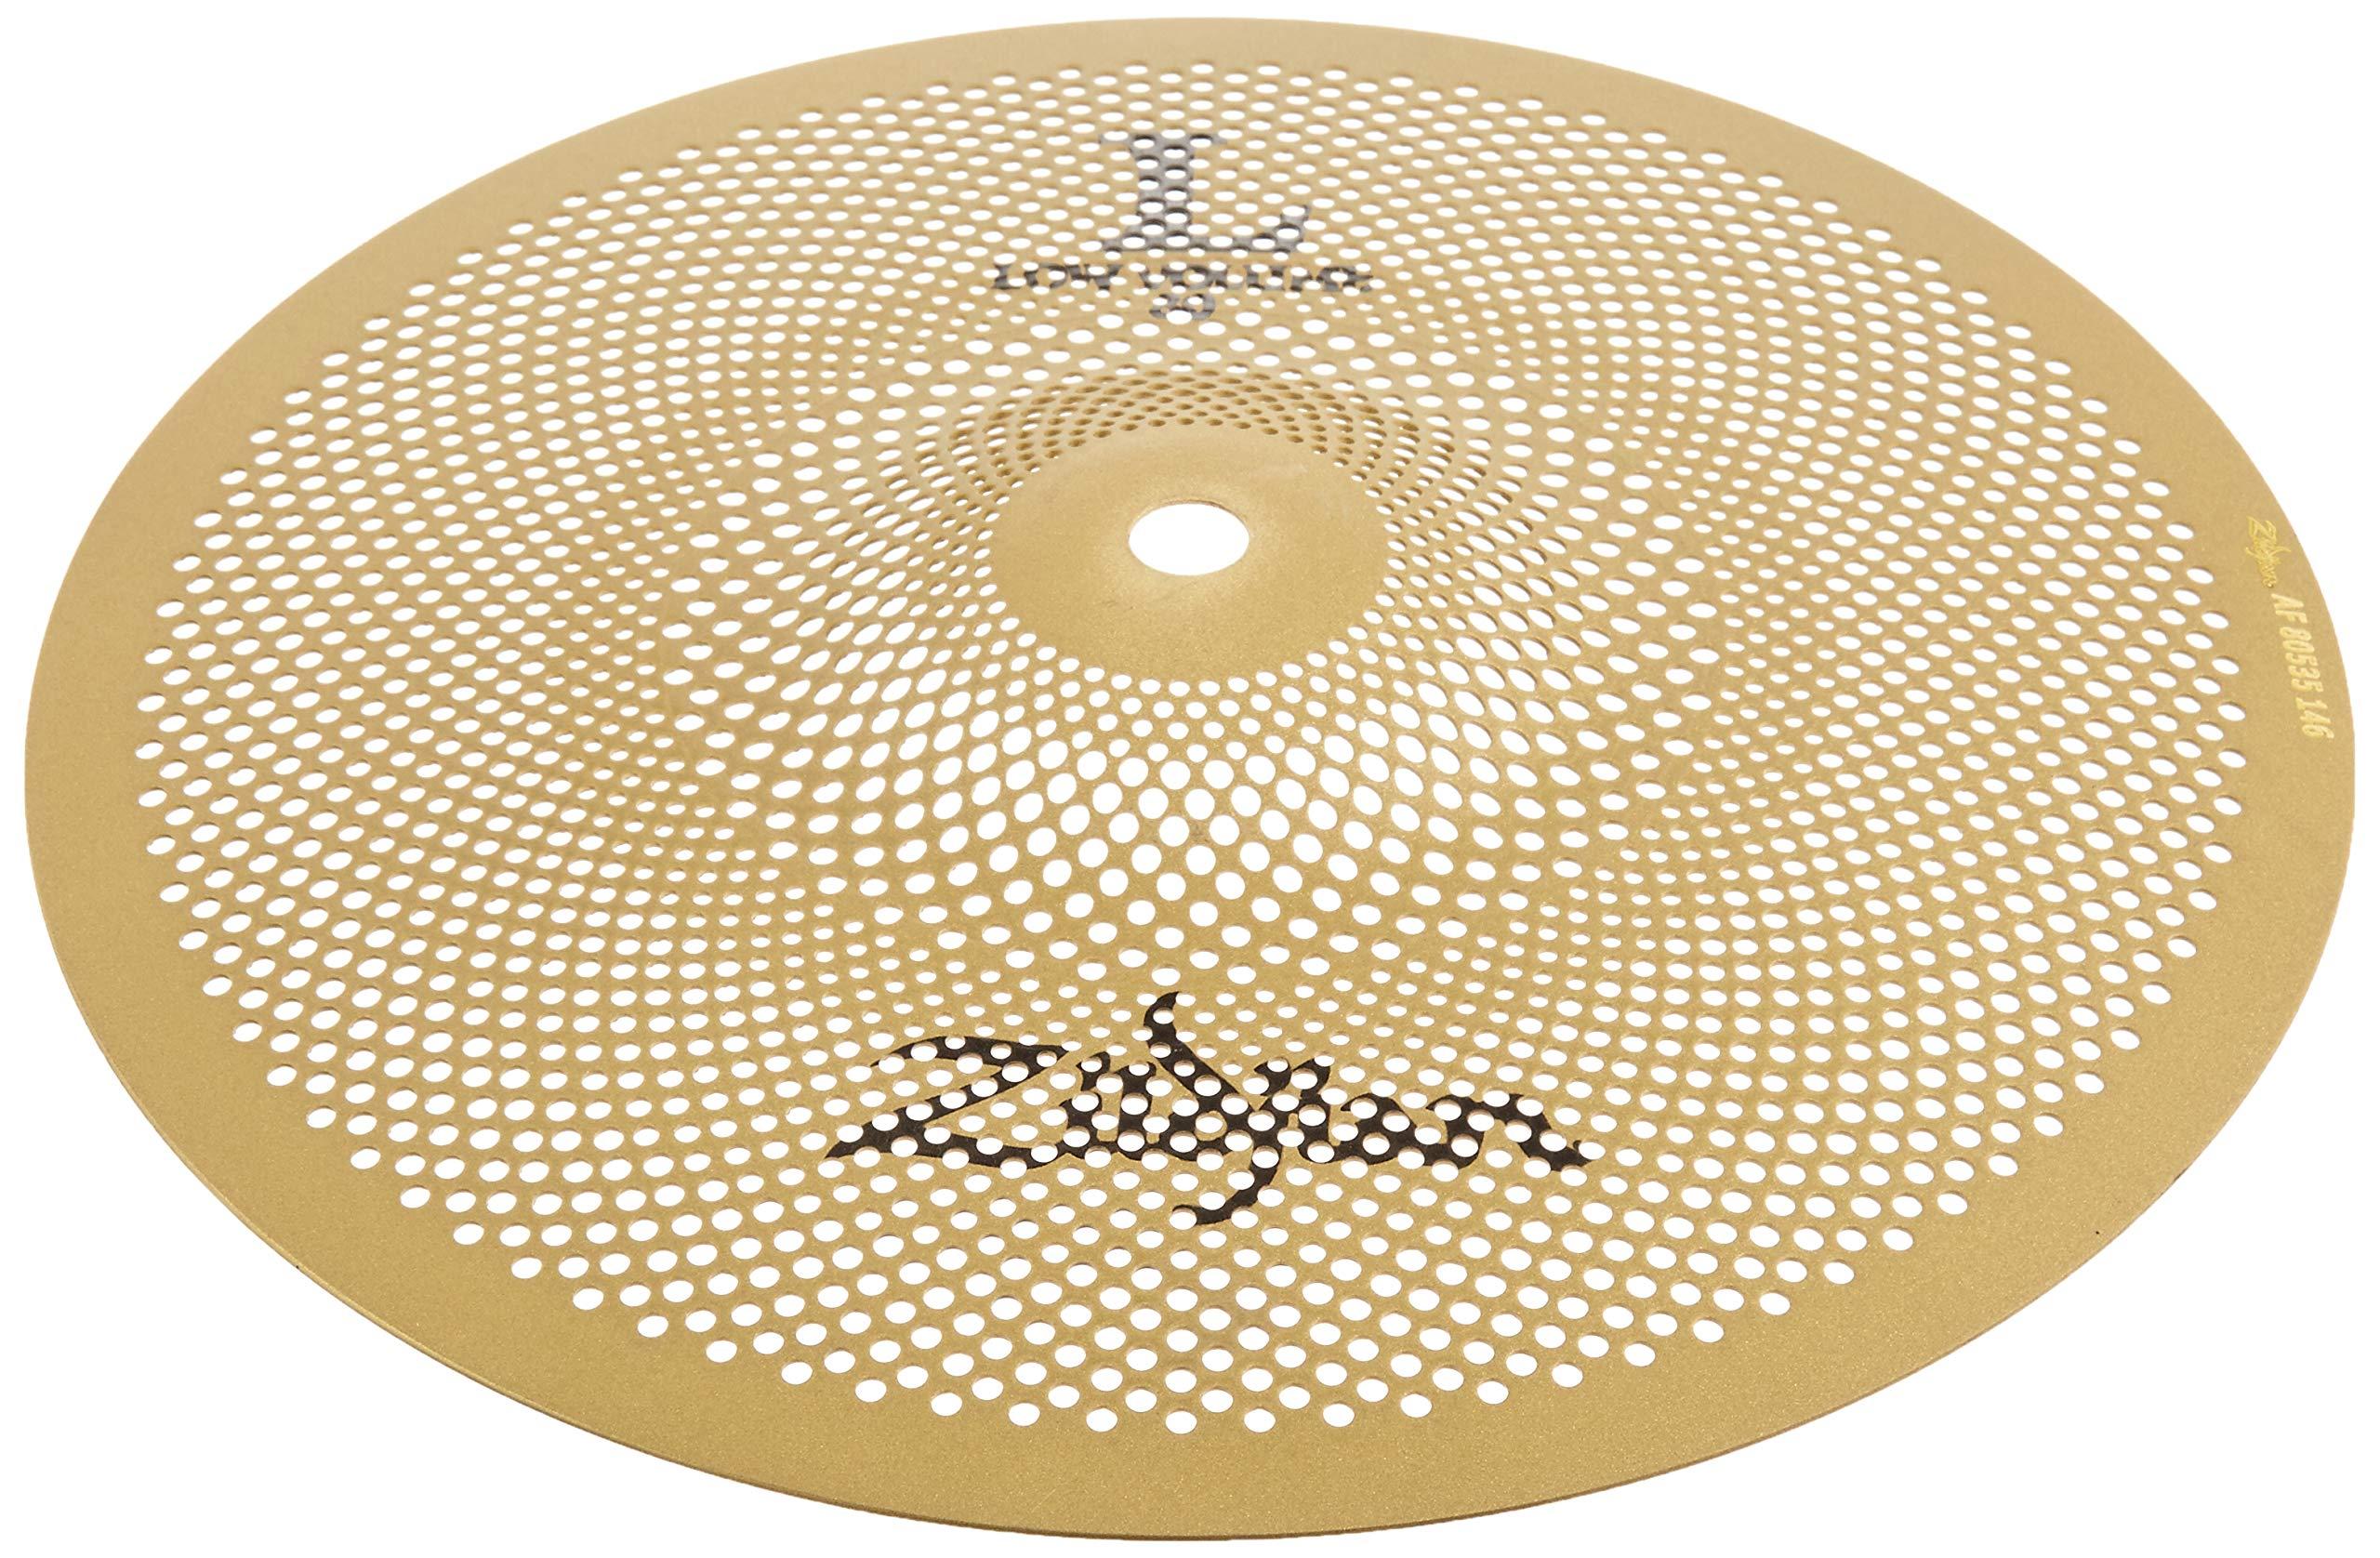 Zildjian L80 Low Volume 10'' Splash Cymbal by Avedis Zildjian Company